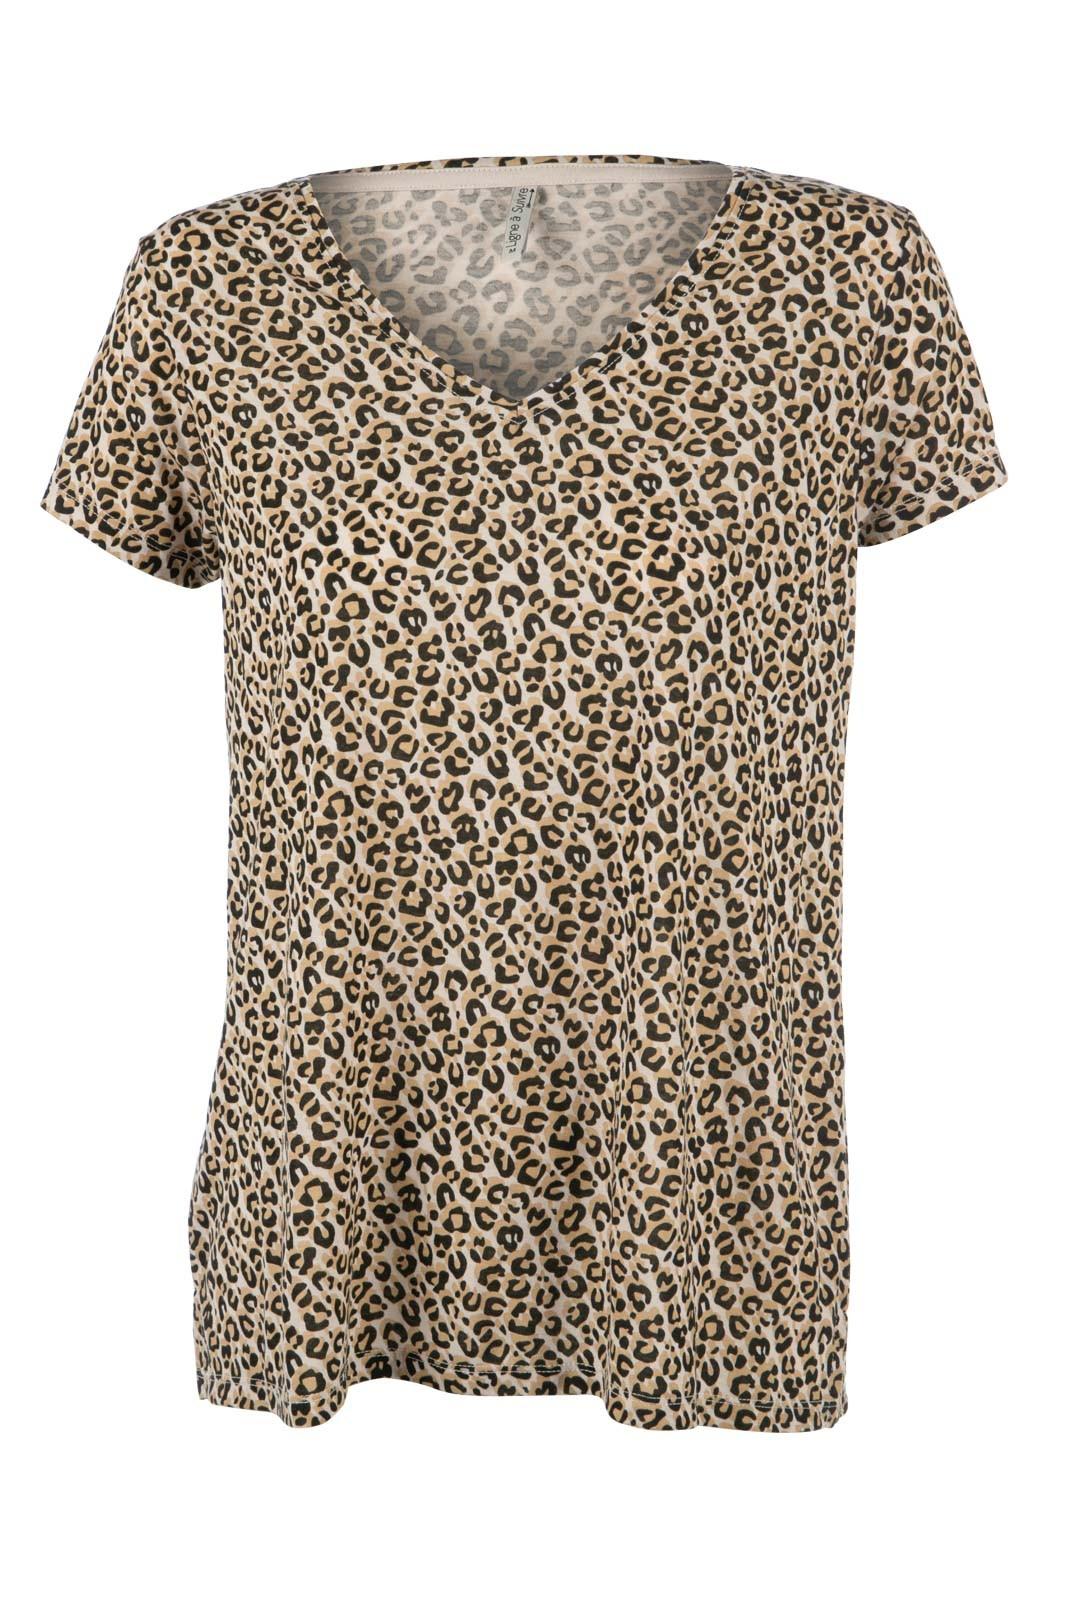 T shirt imprimé léopard femme DistriCenter